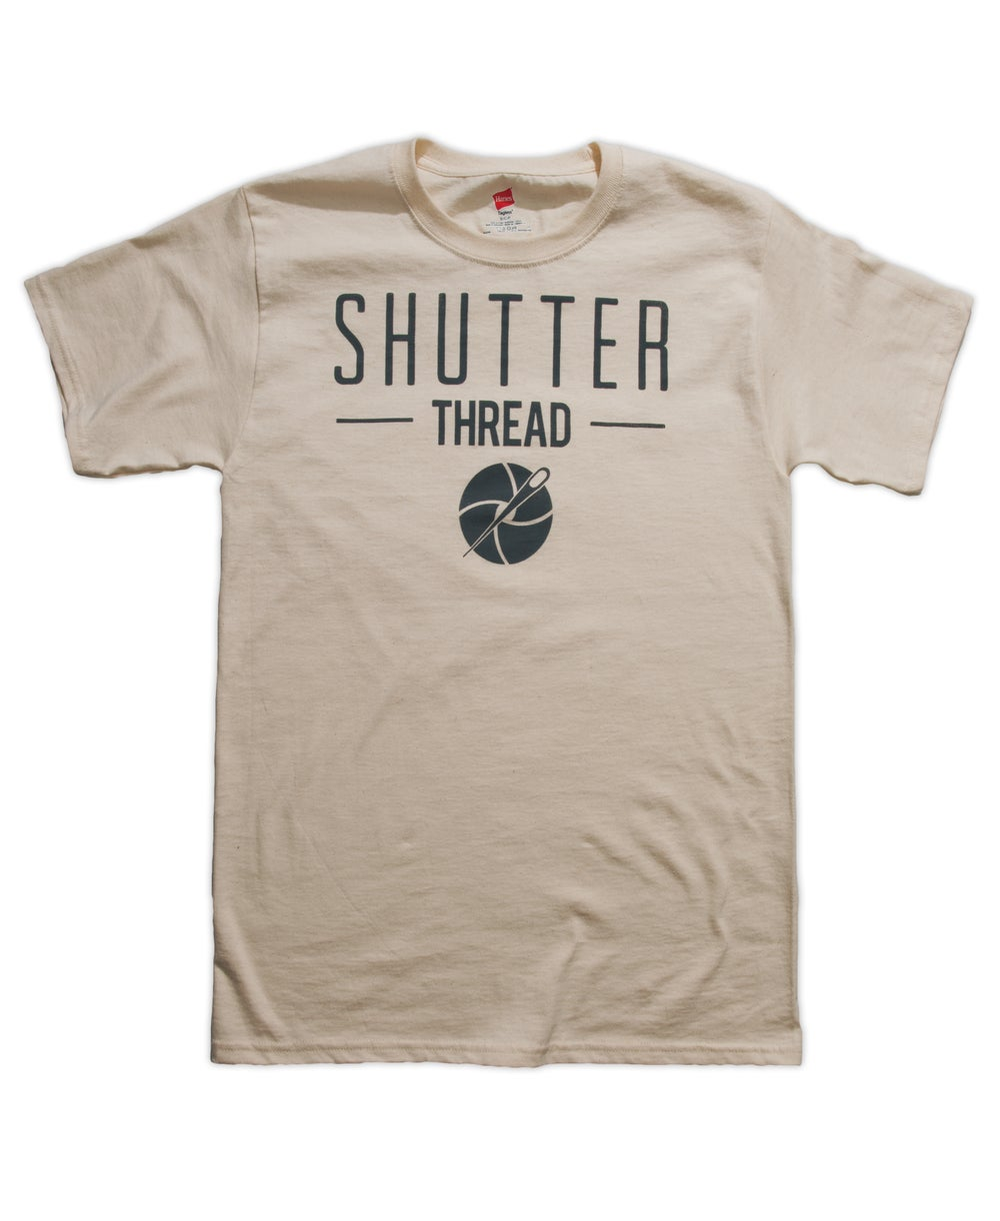 Image of ShutterThread tee